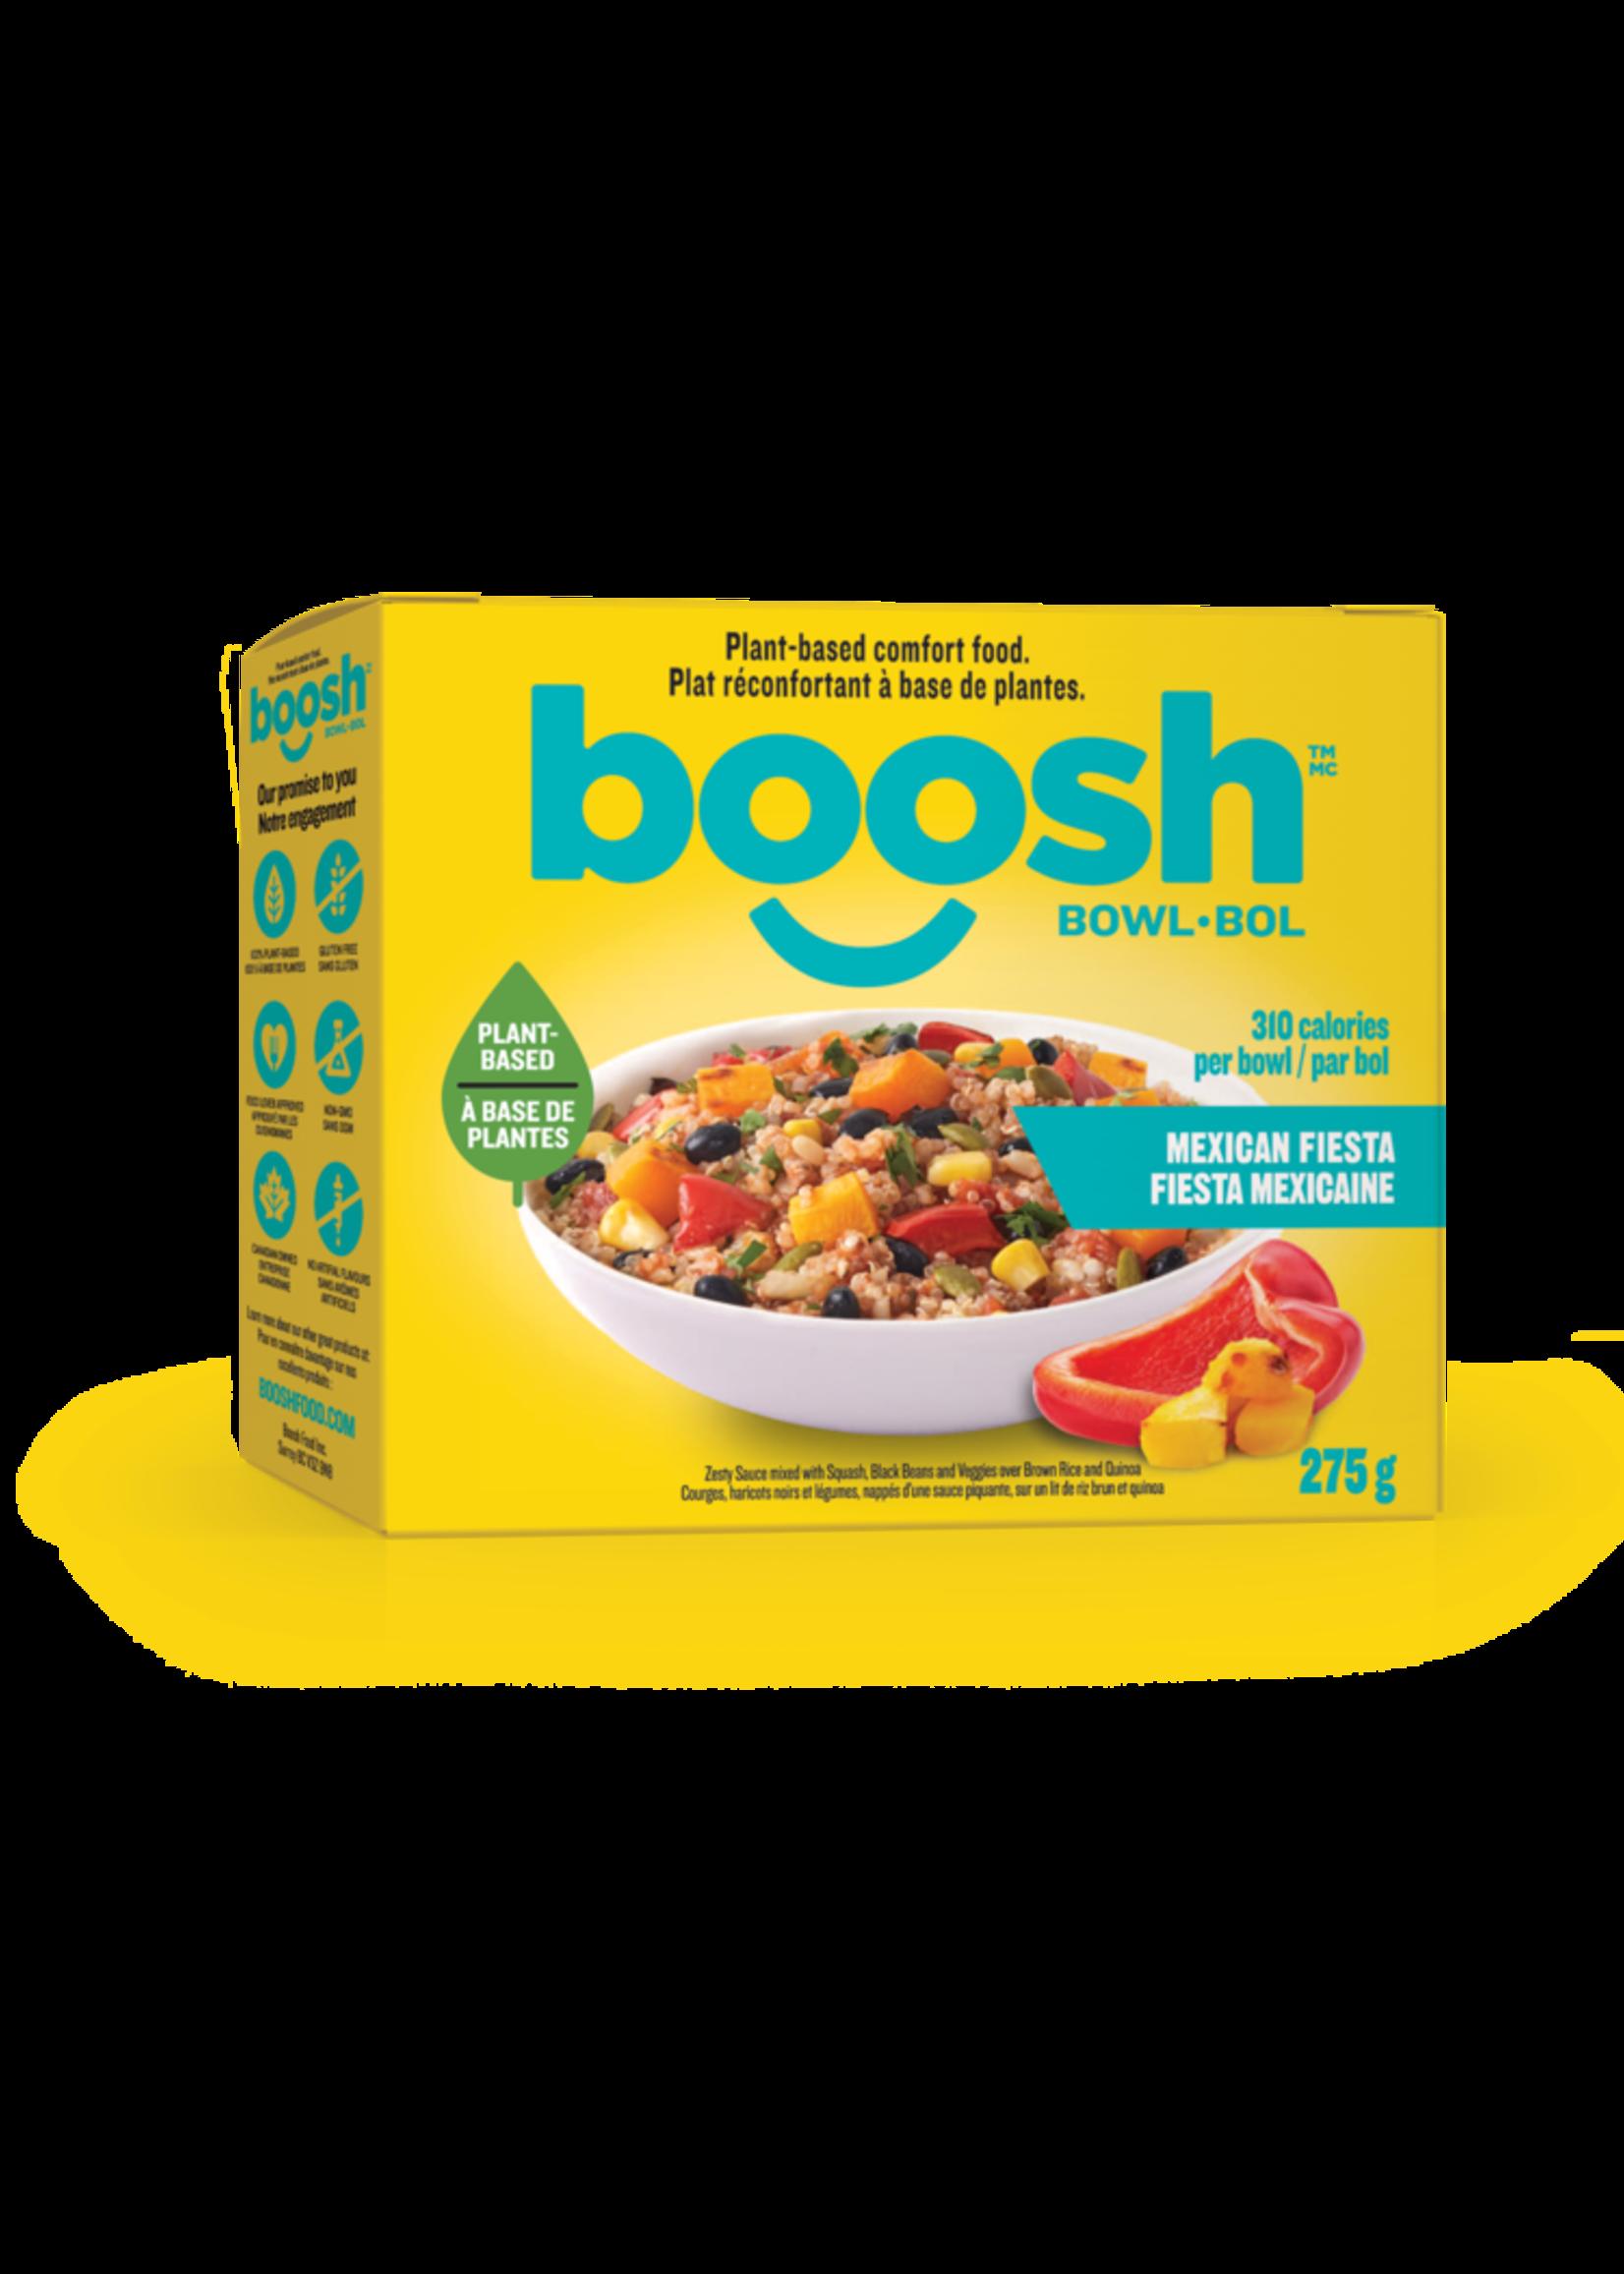 Boosh BOOSH- Mexican Fiesta Bowl